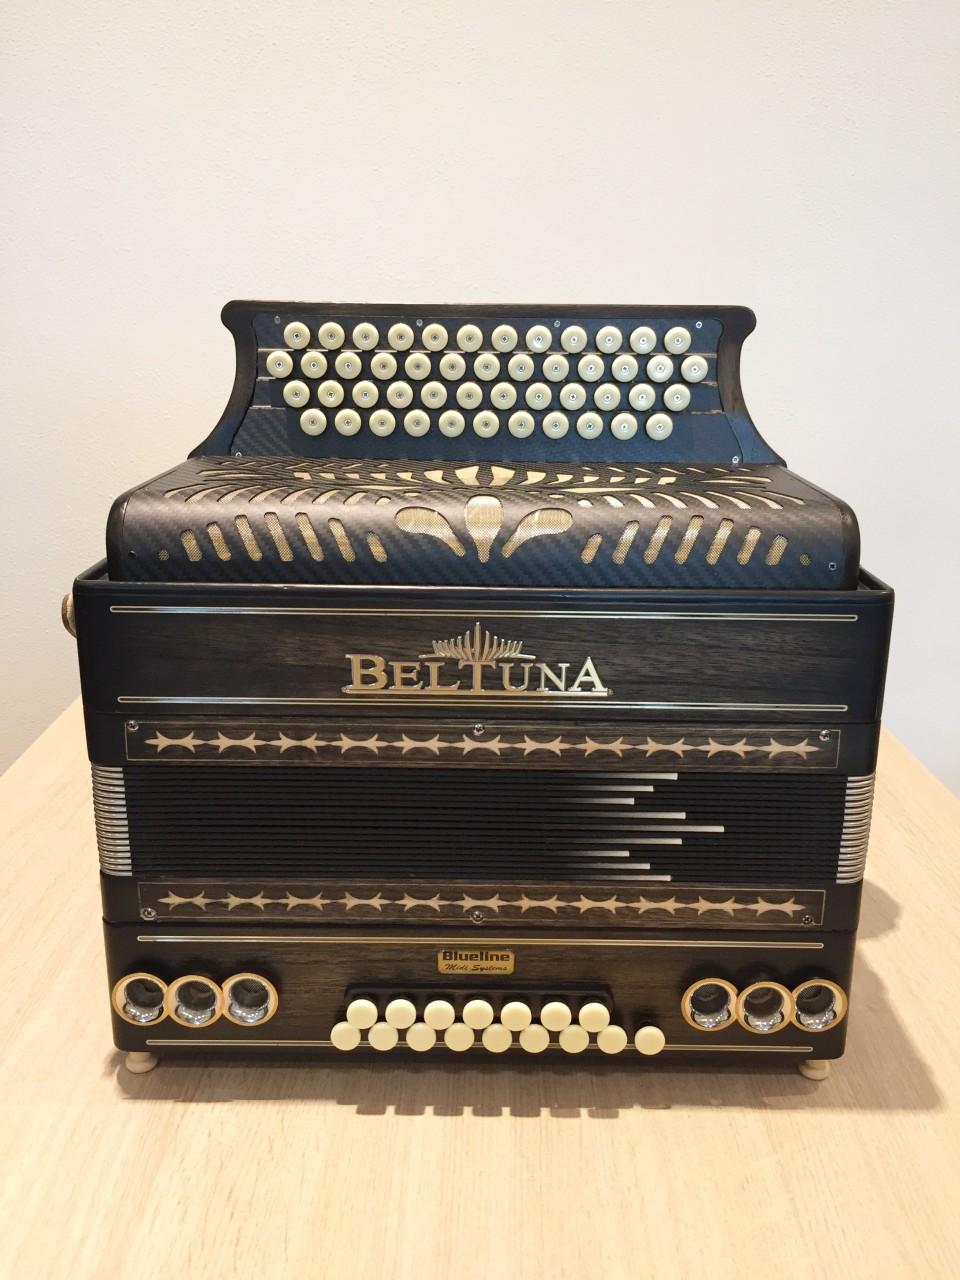 Beltuna Alpstar IV D Exclusiv Fly demo BlueLine Midi Funk MF-Pro